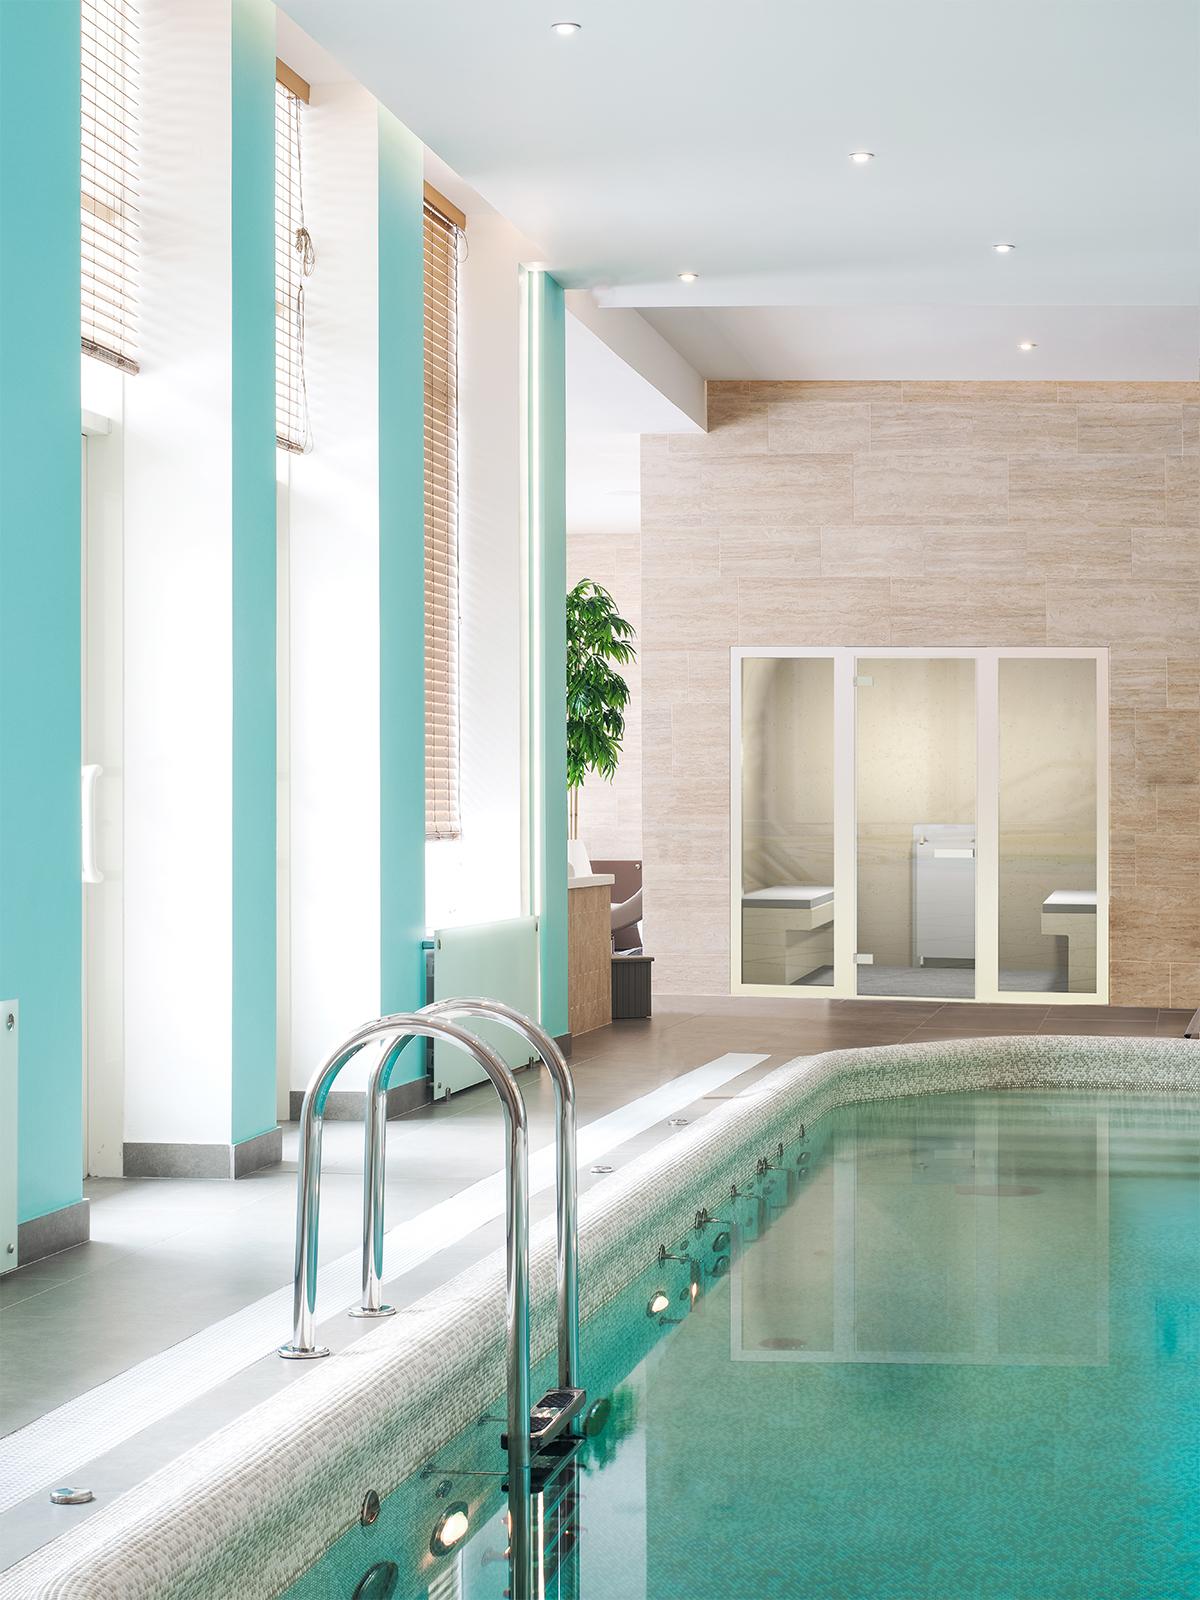 Prachtige stoomcabine, Cleopatra B.V., world of wellness, spa faciliteiten, luxe